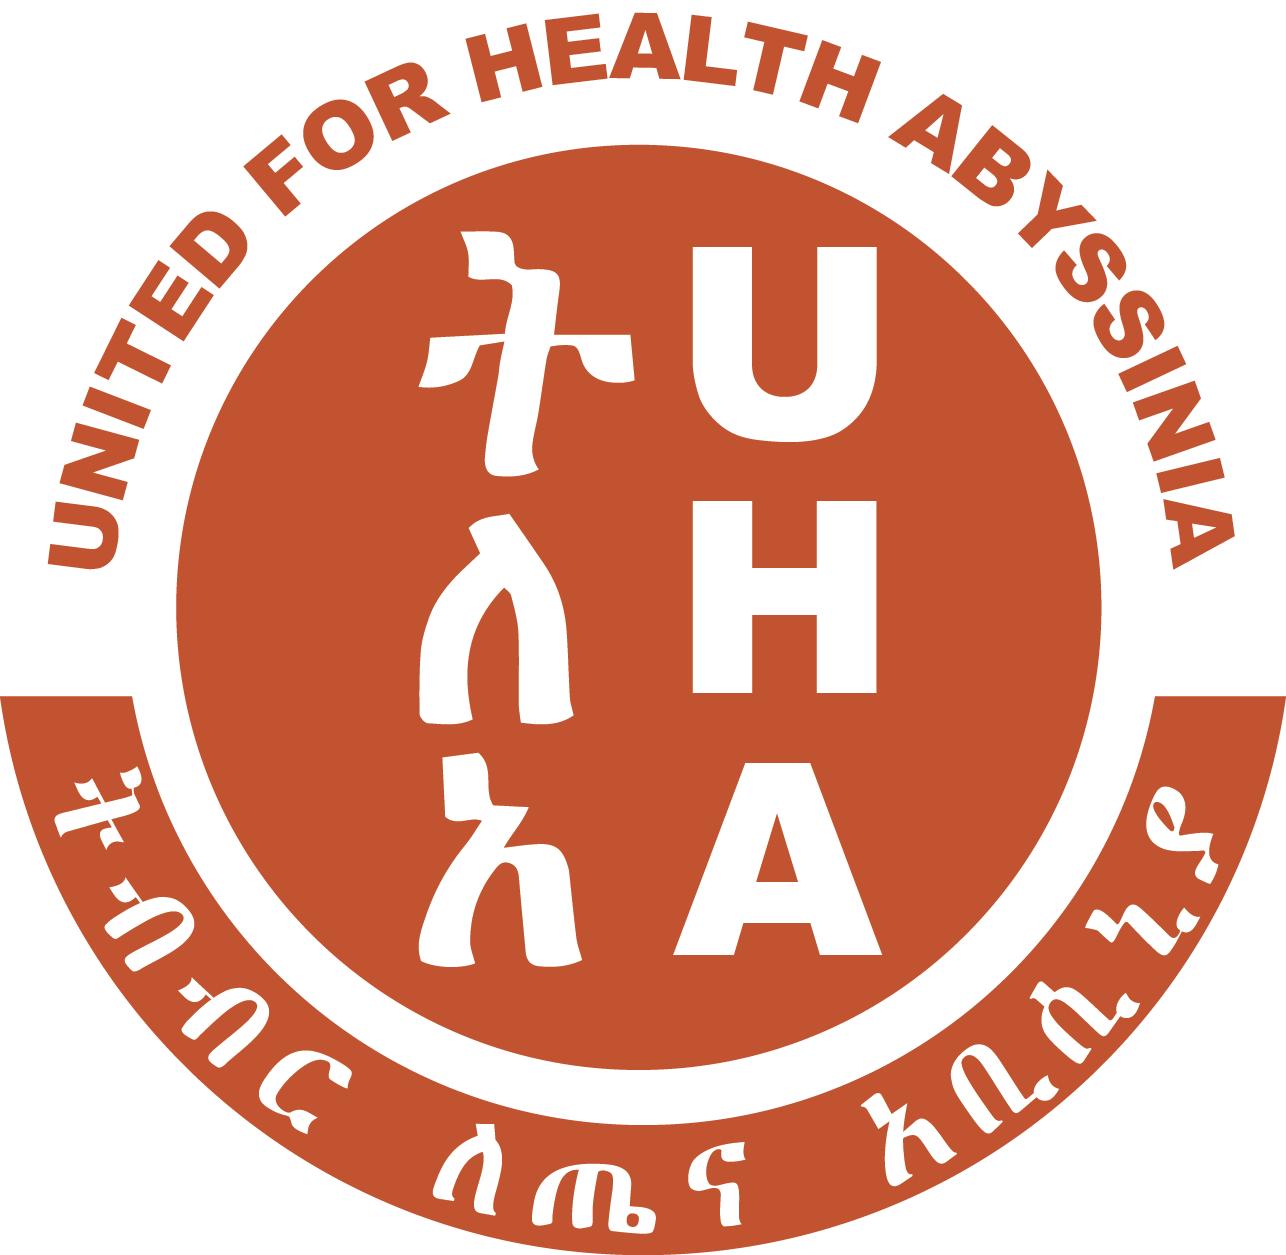 Healthforabyssinia.org